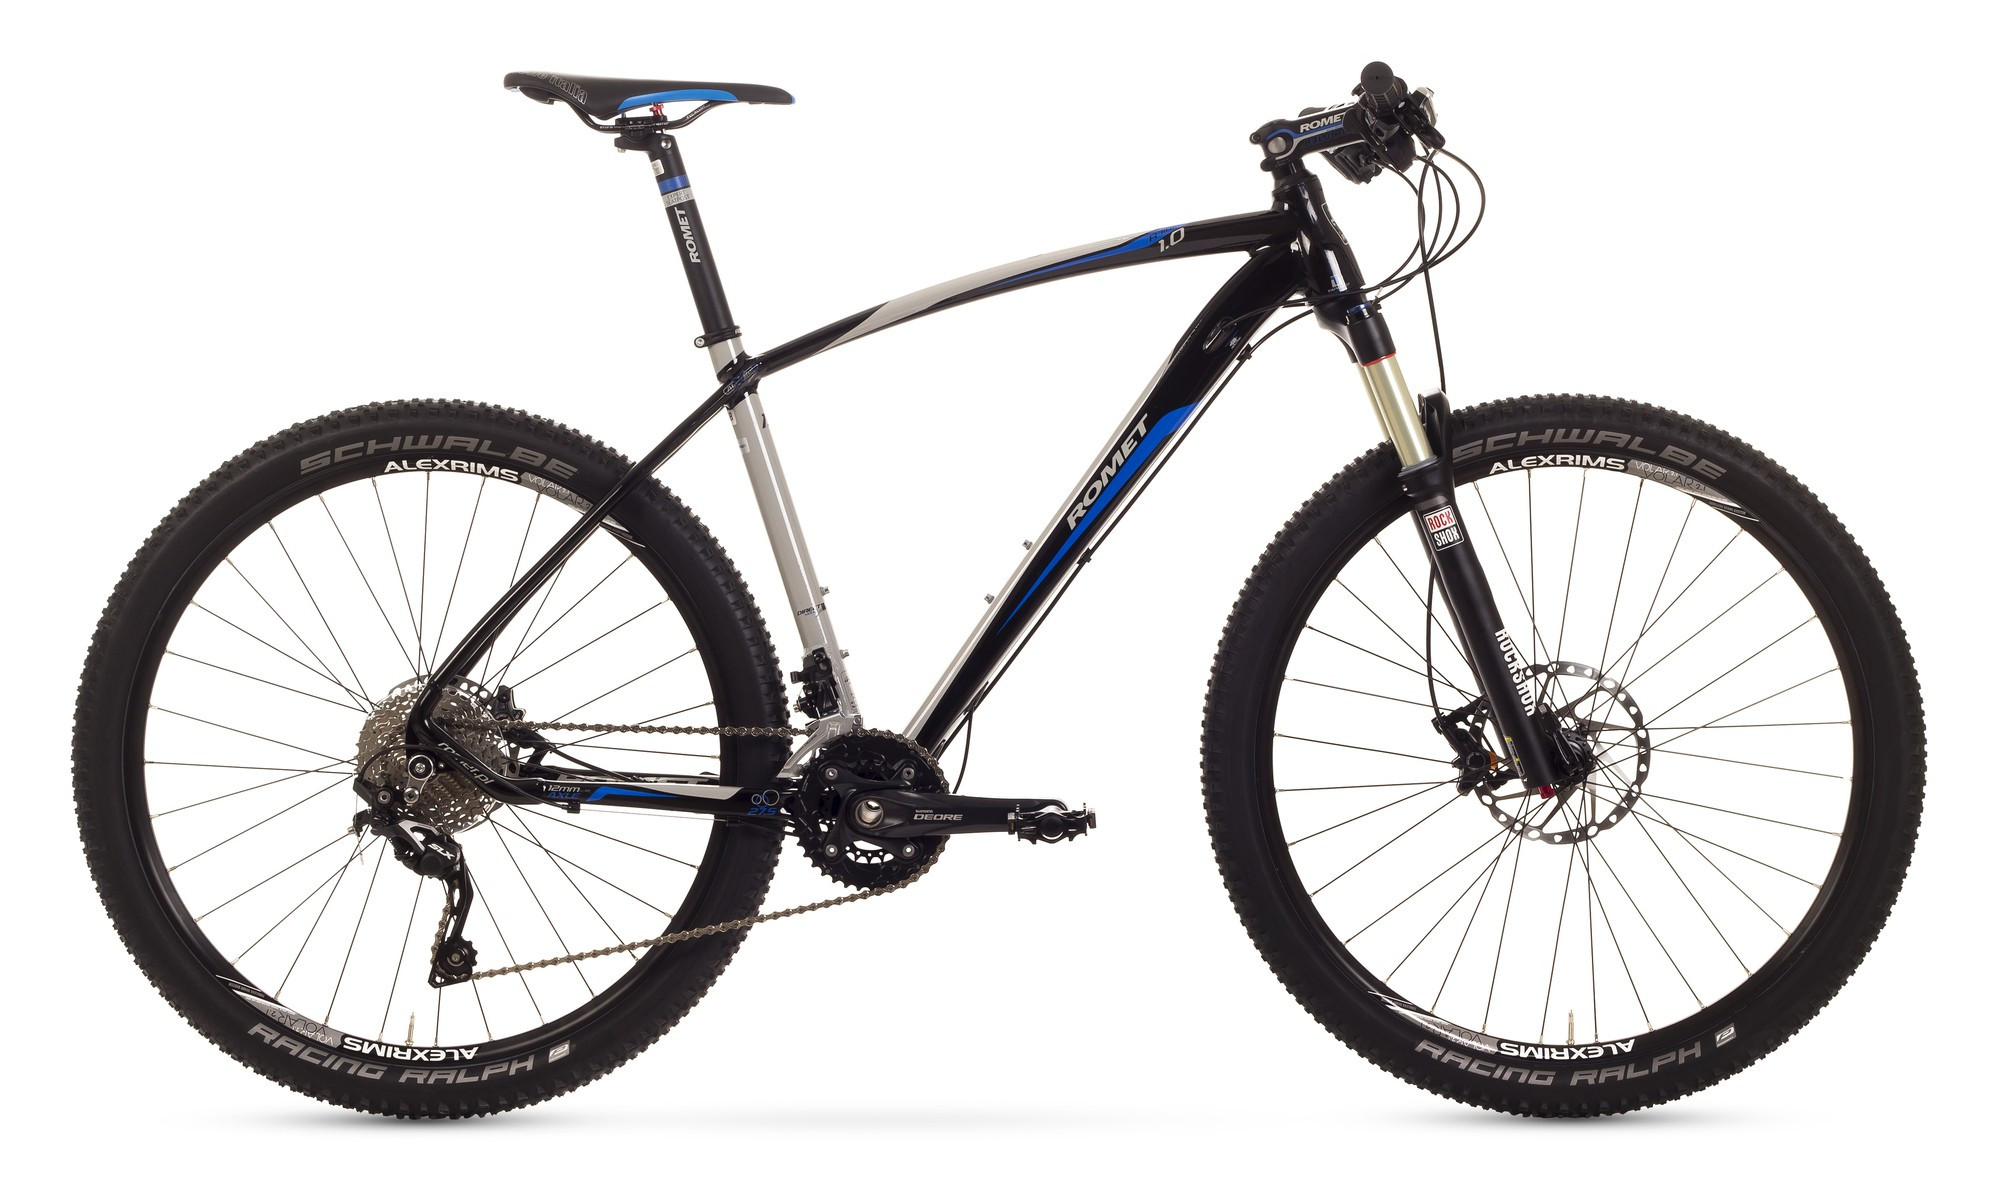 Bicicleta MTB Romet Mustang R-line 27.5 1.0 - crom-negru-albastru